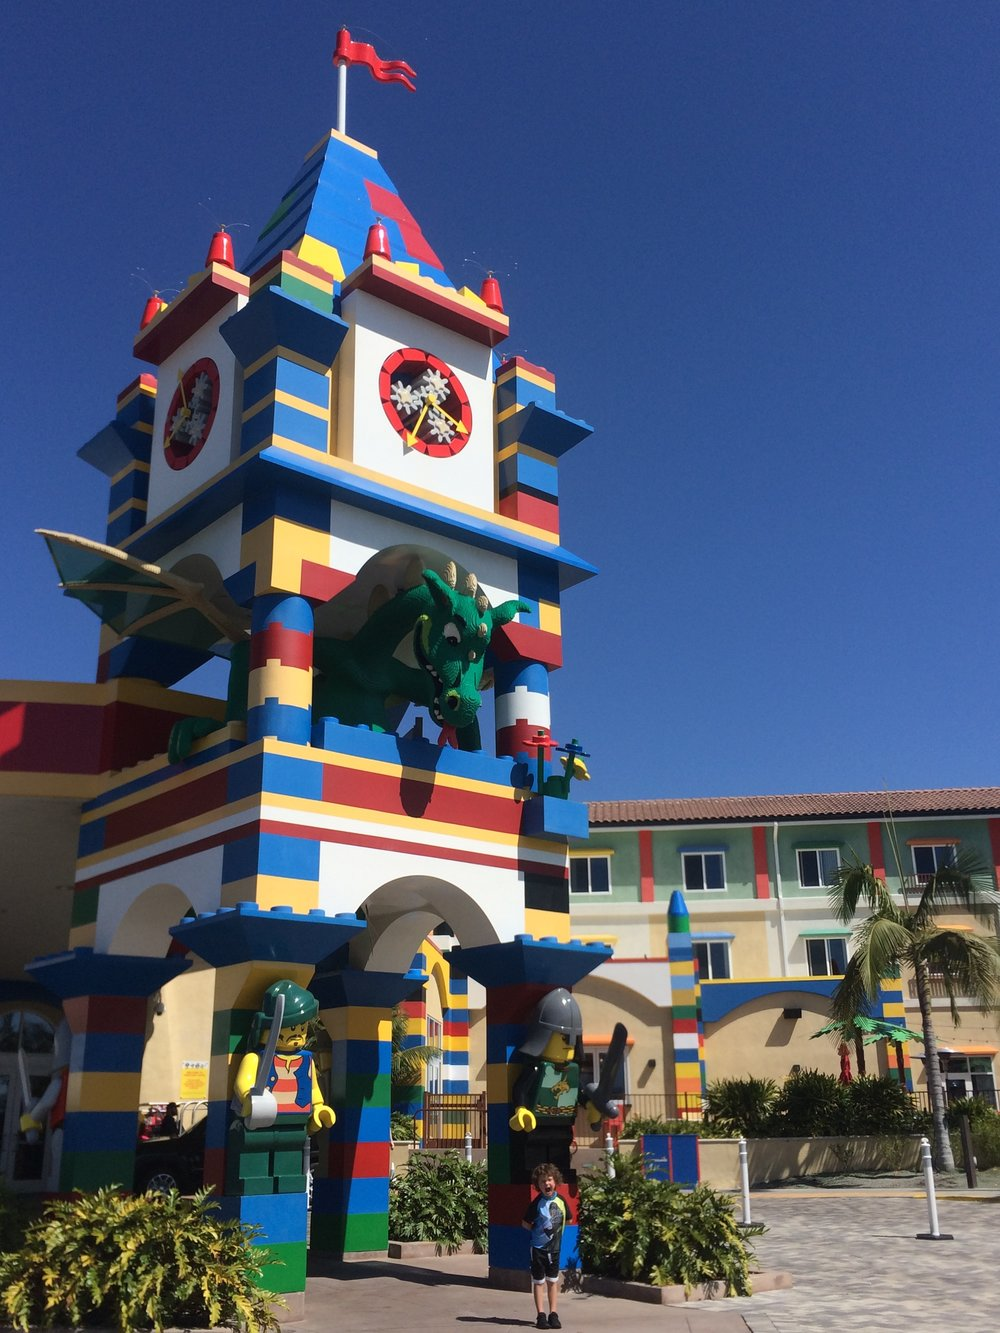 The impressive Legoland Hotel